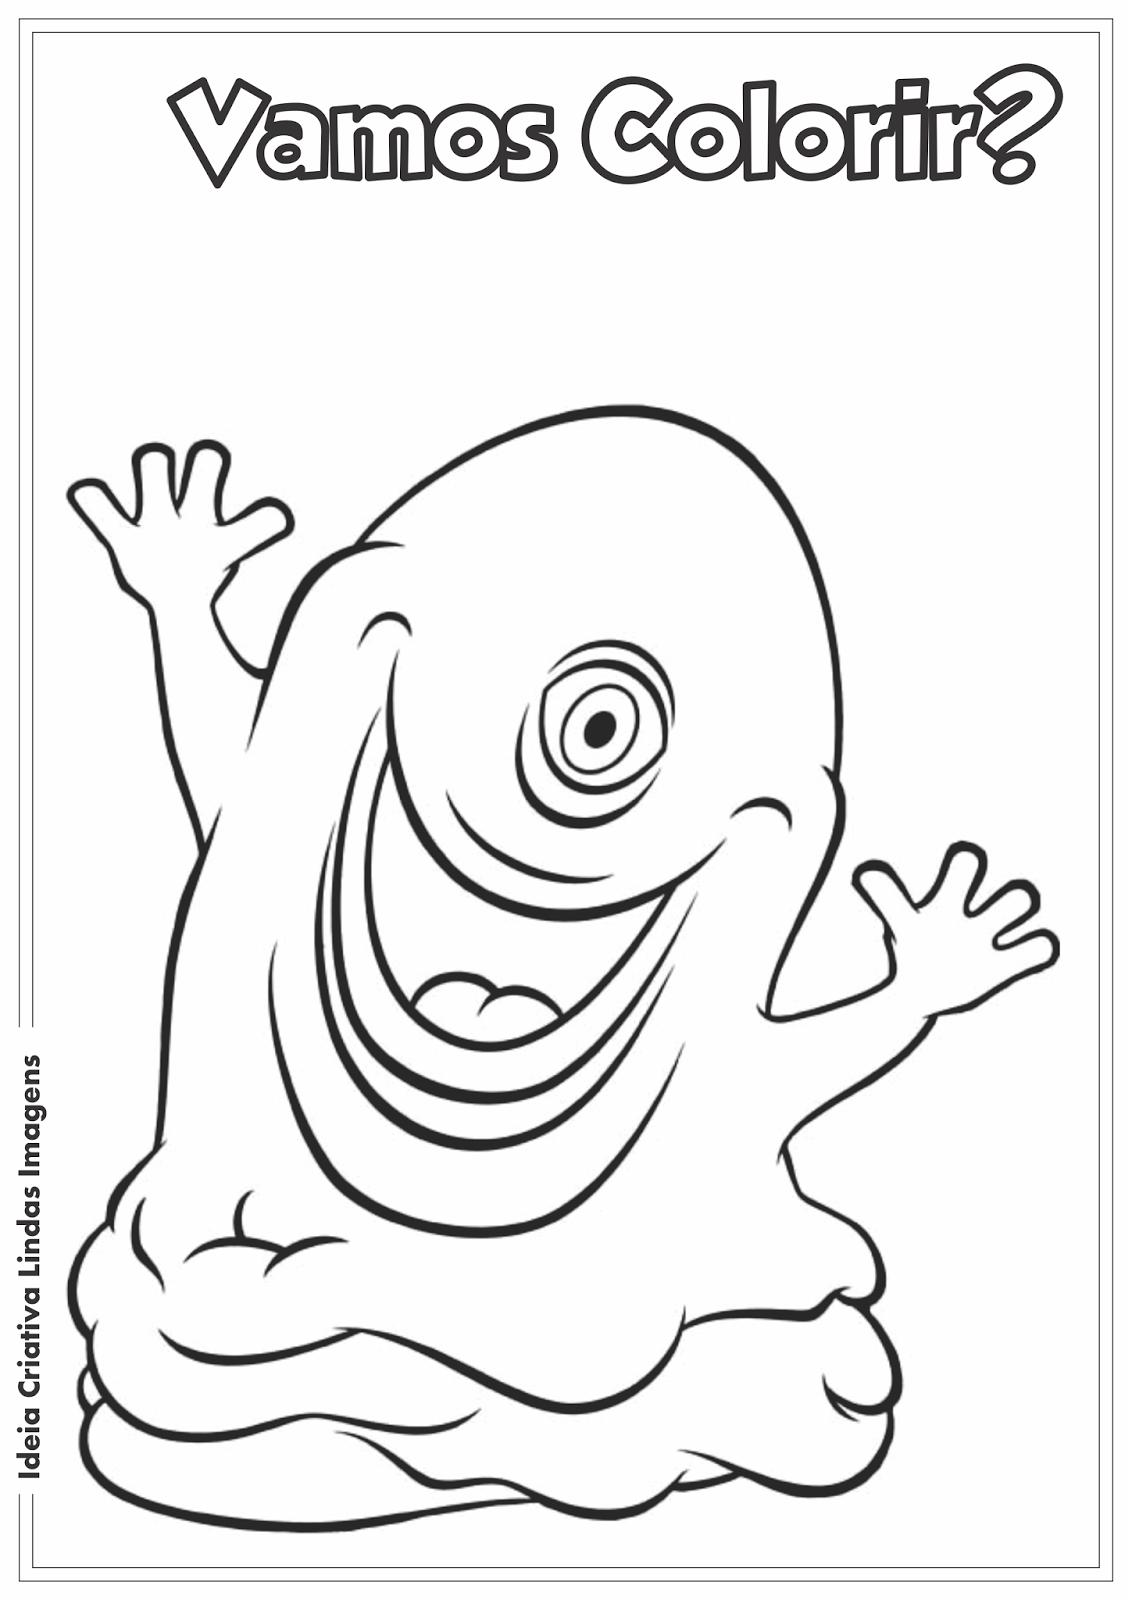 Desenho pra colorir Monsters vs Aliens